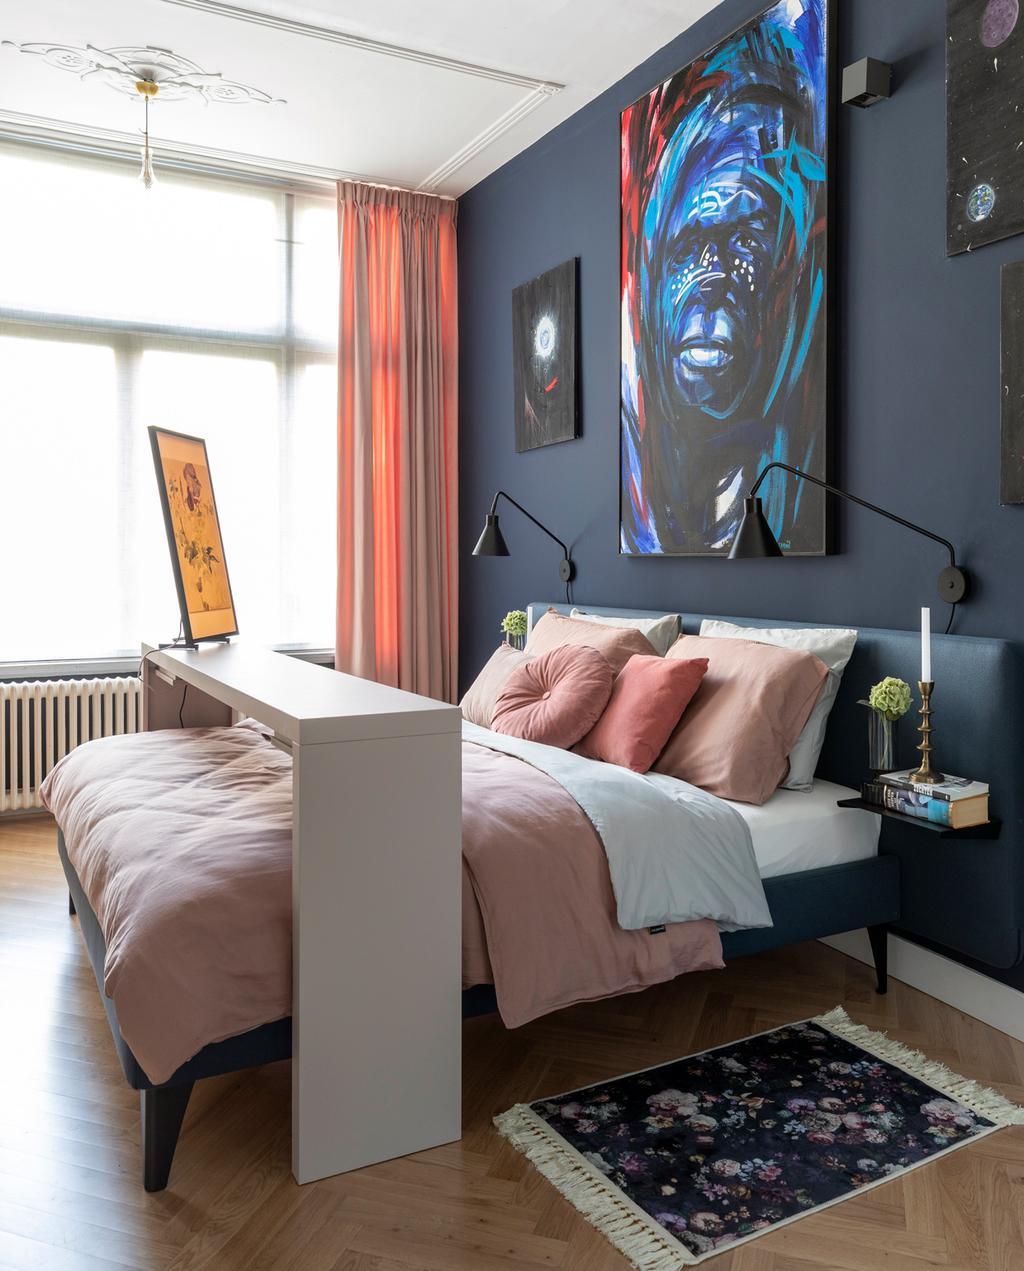 vtwonen weer verliefd op je huis   aflevering 12 seizoen 13   stylist Marianne in Rotterdam